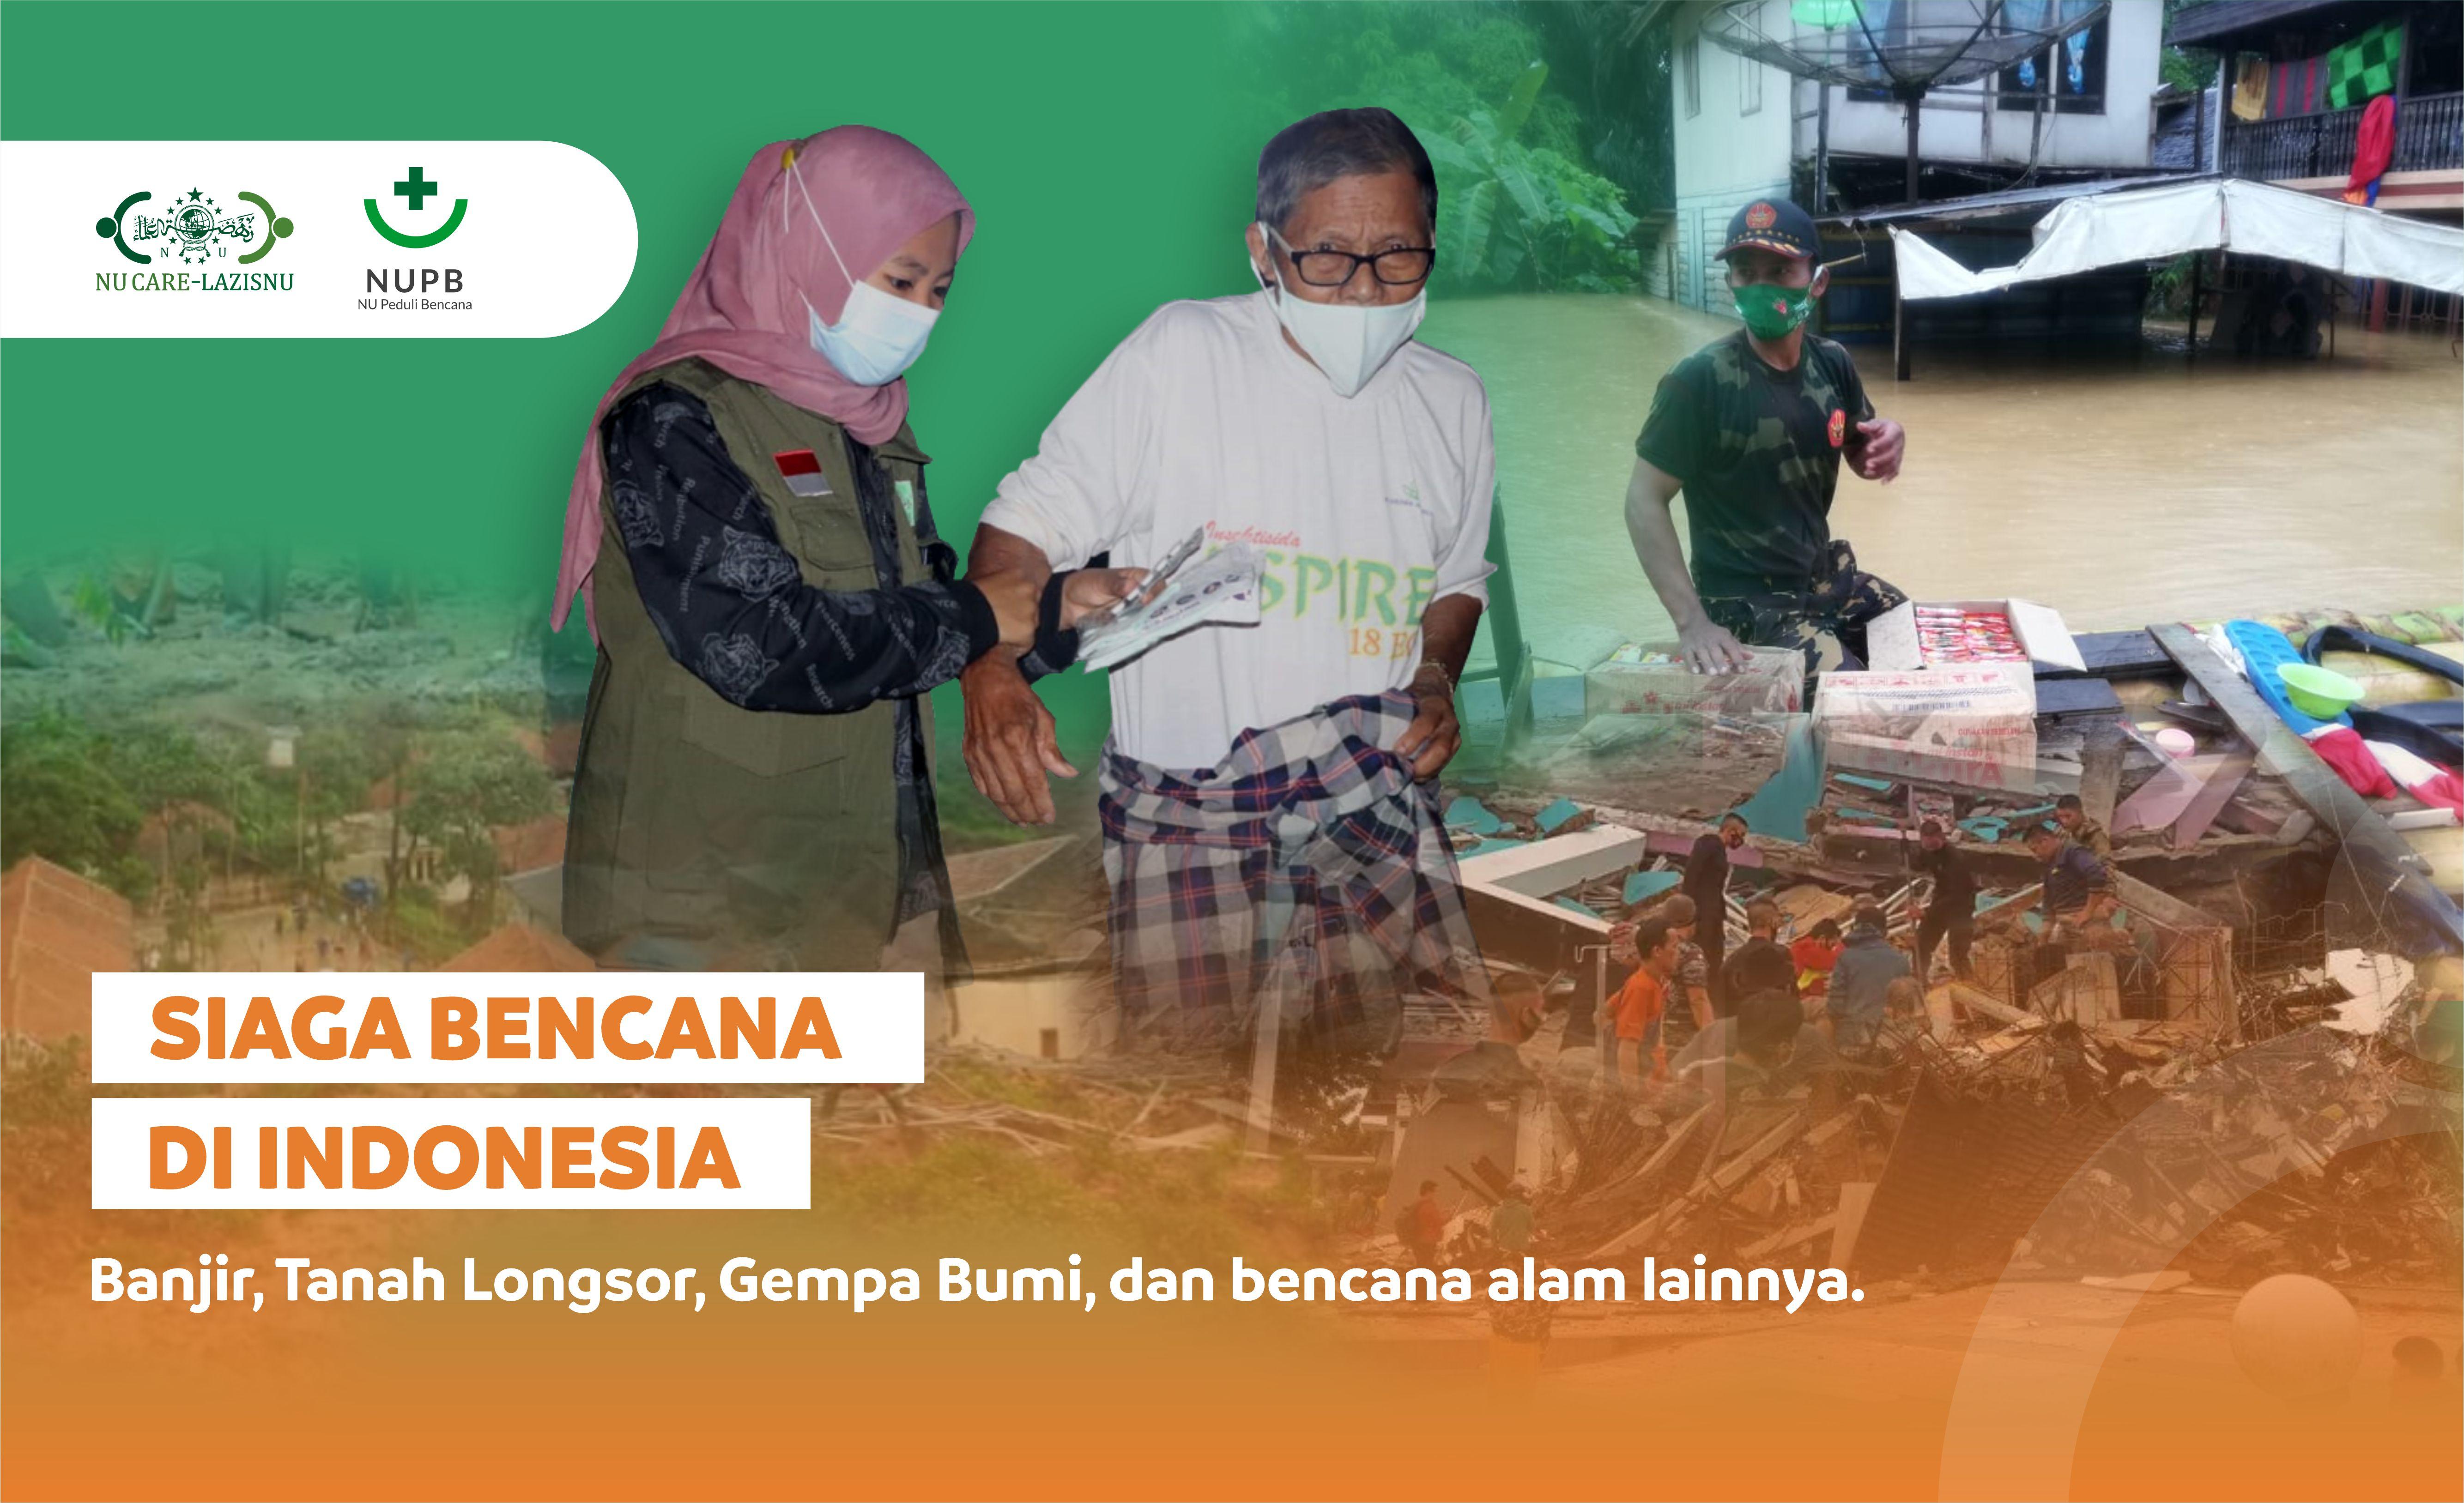 Siaga Bencana di Indonesia